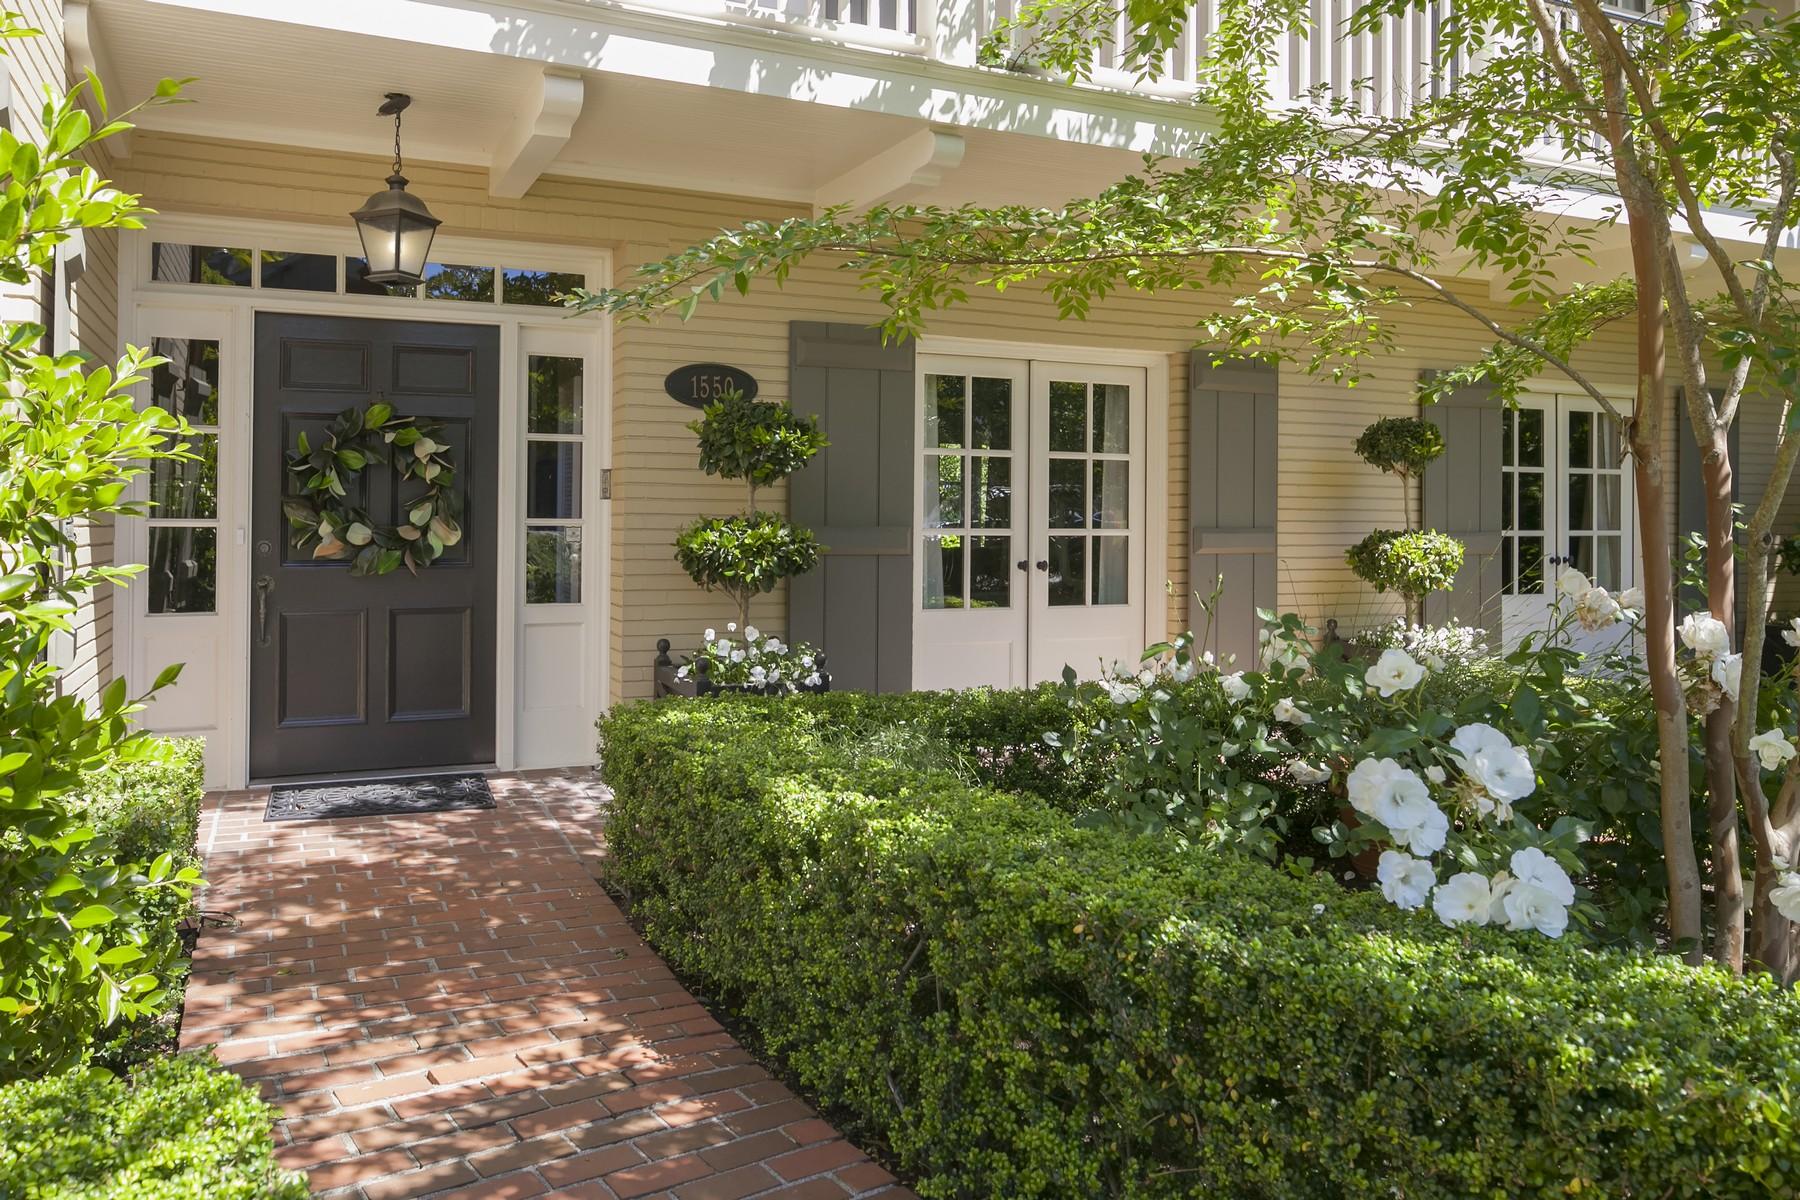 Single Family Home for Sale at 1550 Shenandoah Dr E Seattle, Washington 98112 United States